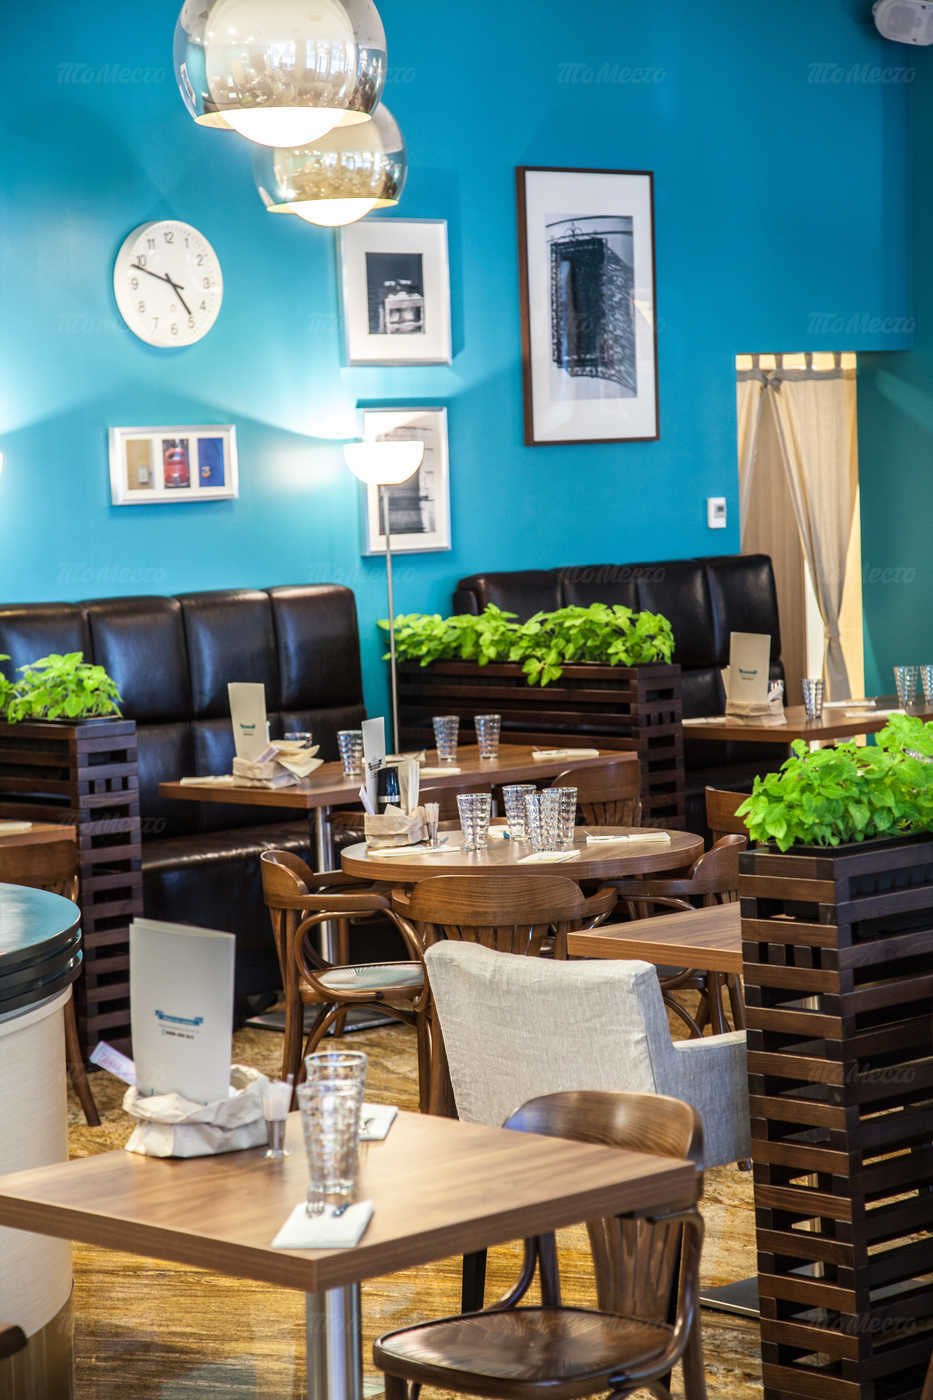 Меню кафе Кафе 64 (CAFFE 64) на Малоохтинском проспекте